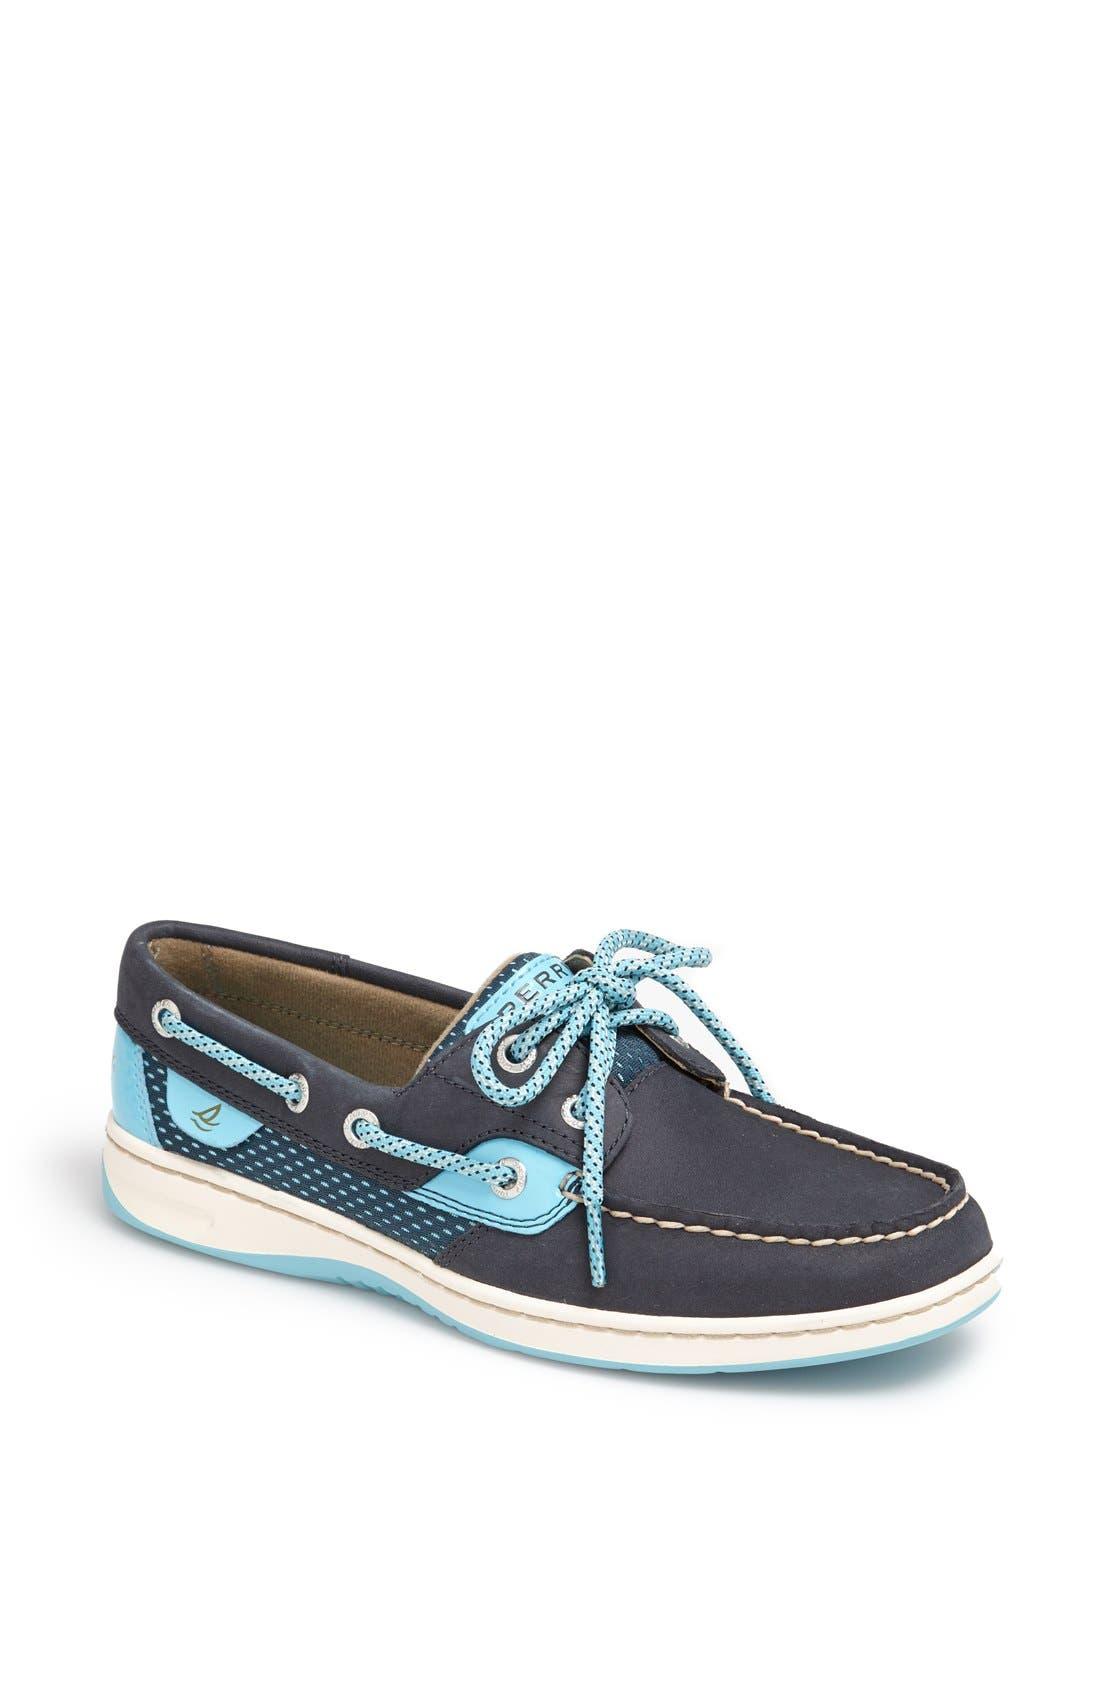 Alternate Image 1 Selected - Sperry 'Bluefish 2-Eye' Boat Shoe (Women)